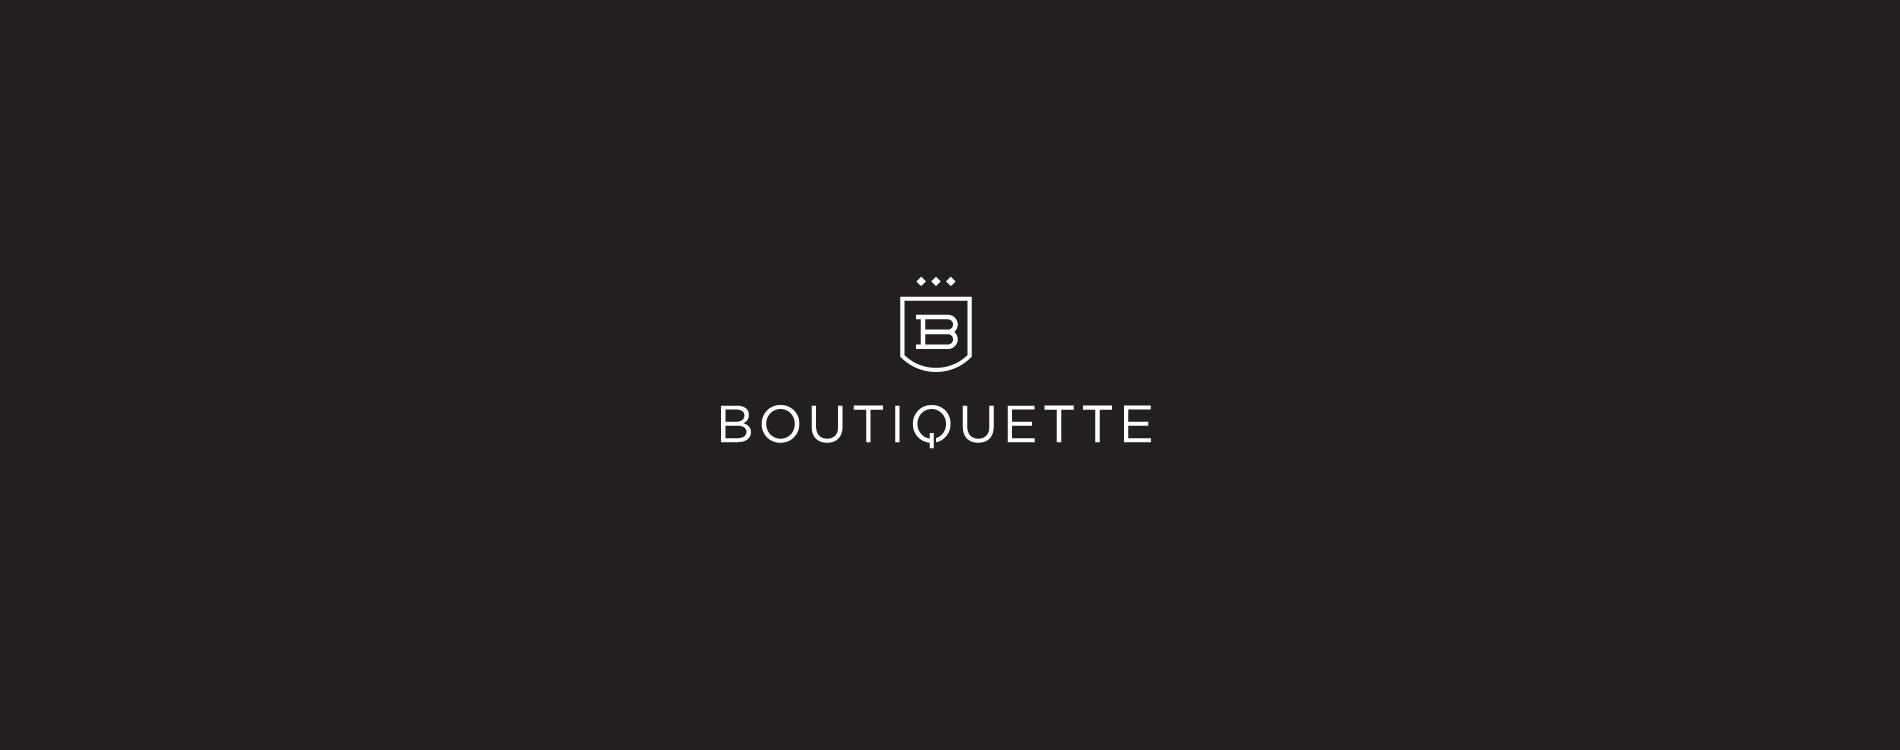 Portfolio boutiquette logo main